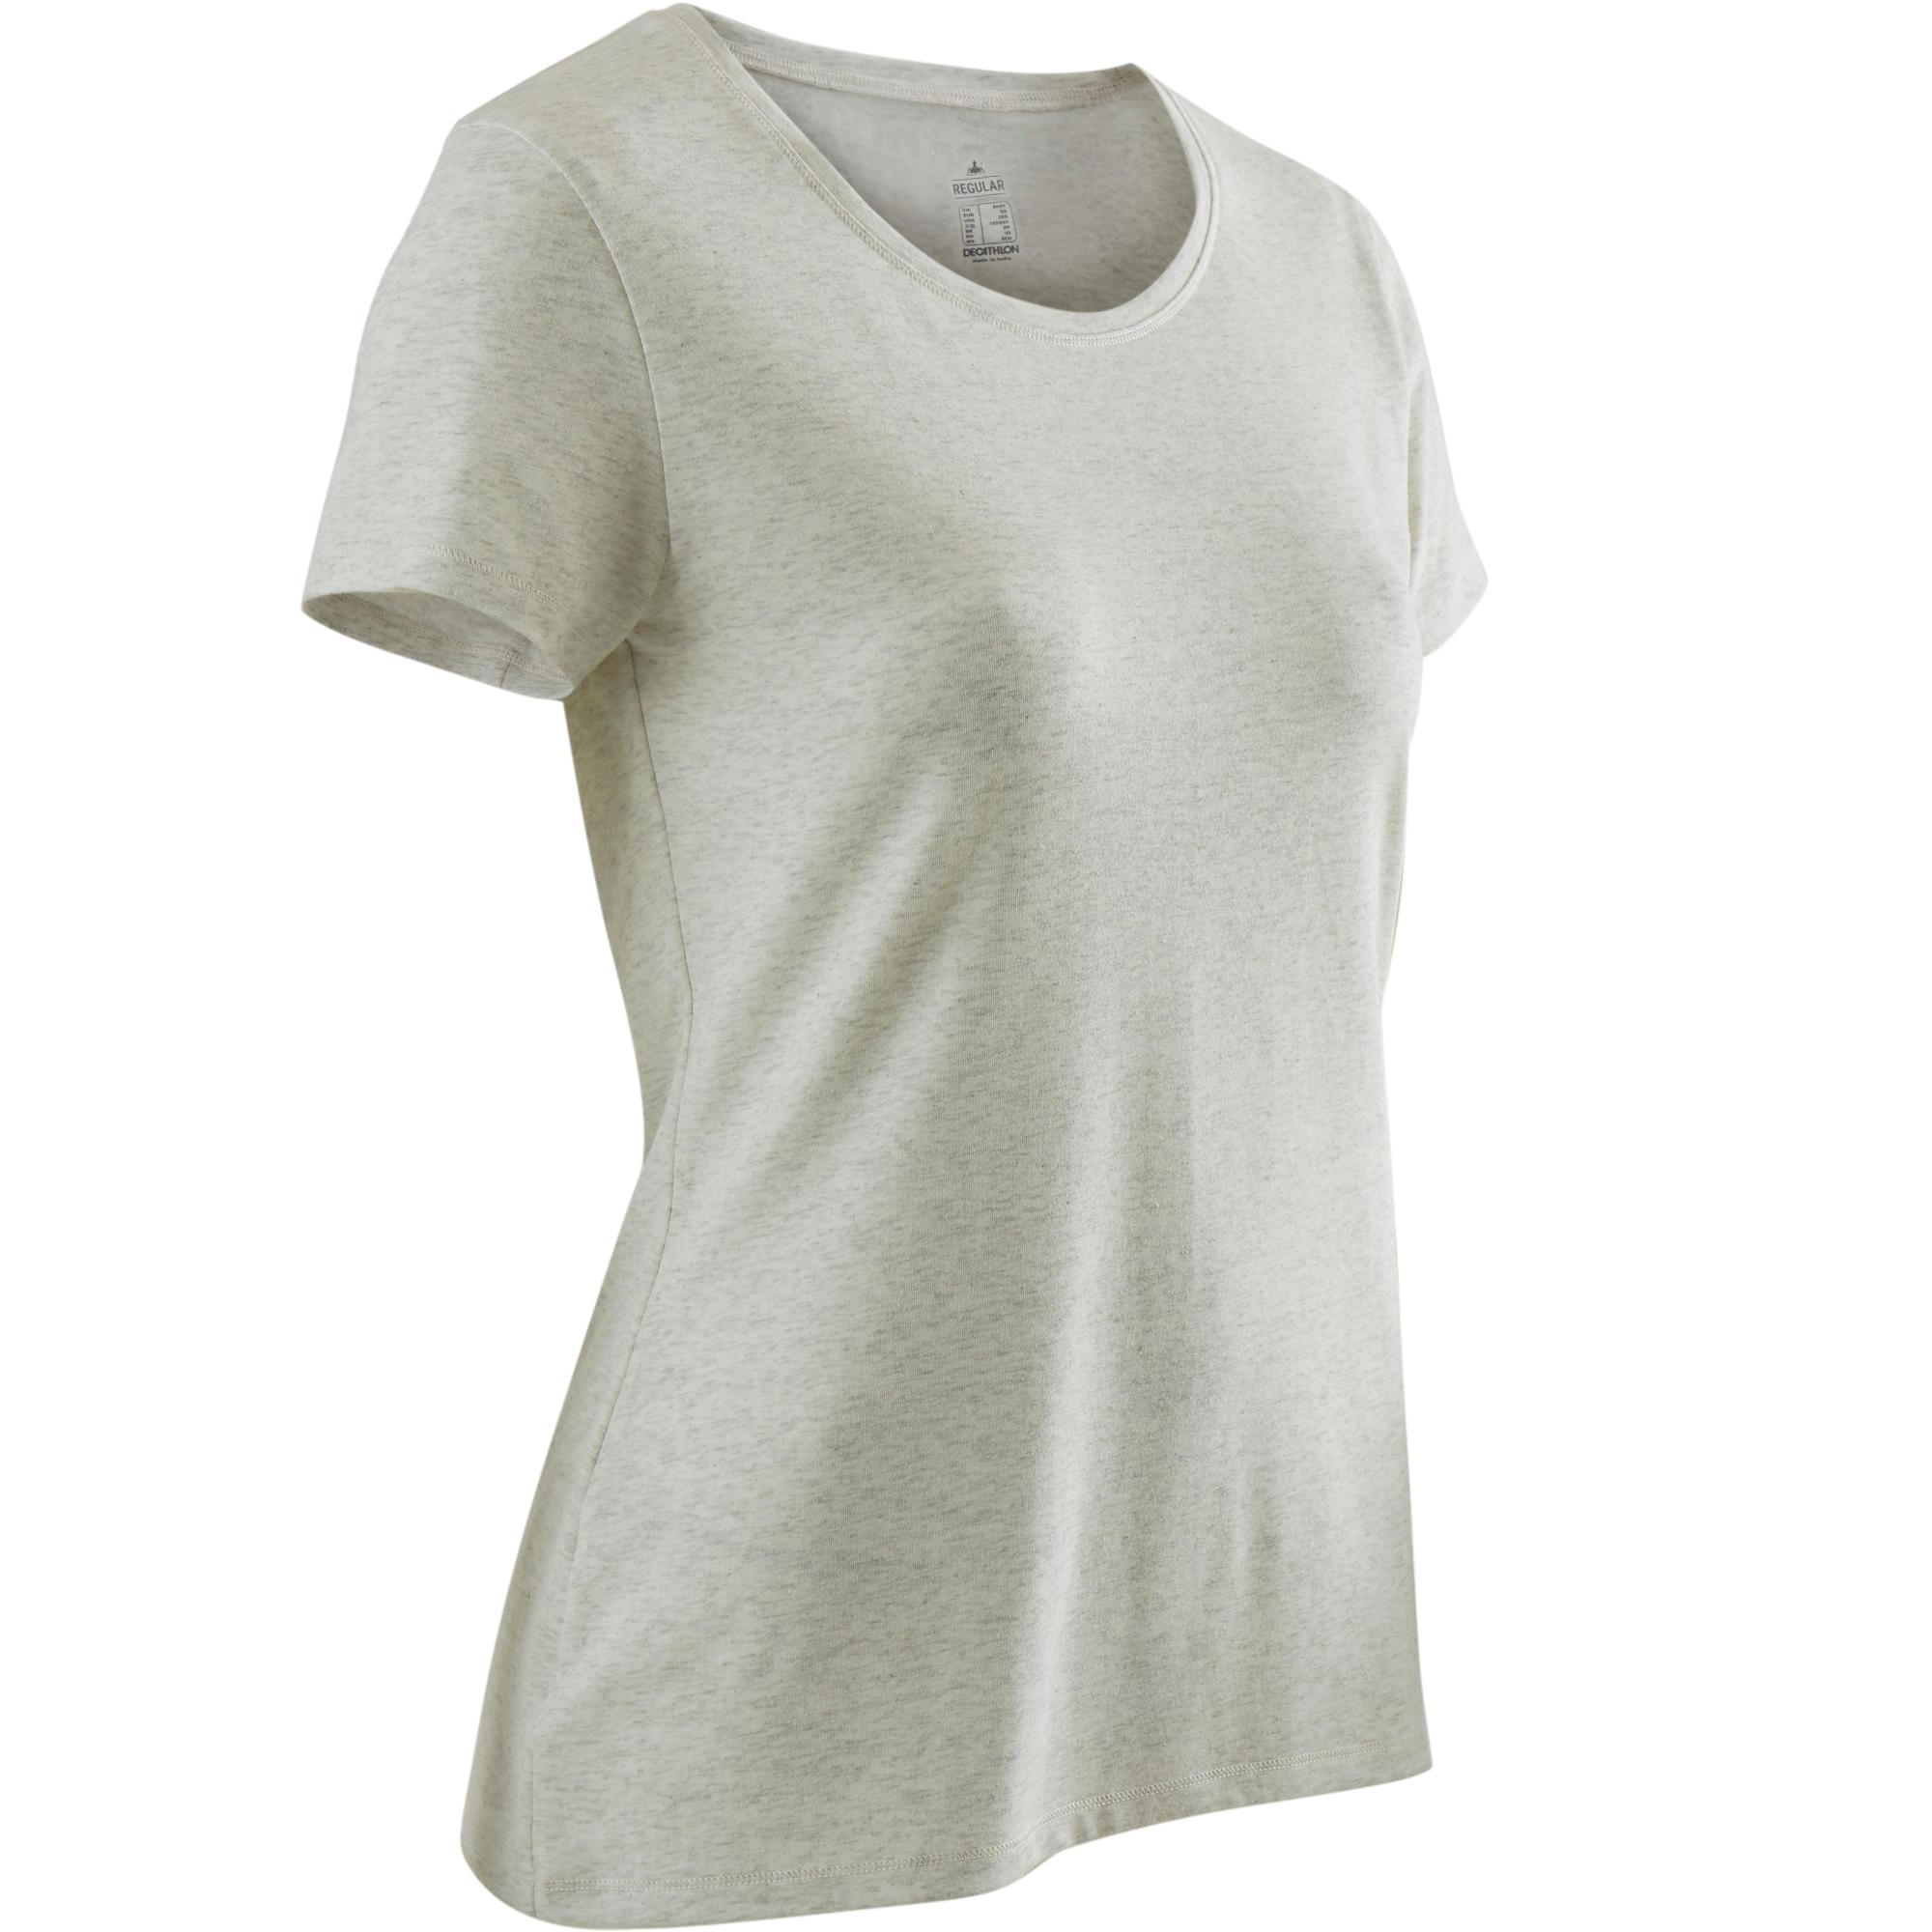 Camiseta Manga Corta Gym Pilates Domyos 500 Regular Mujer Blanco AOP